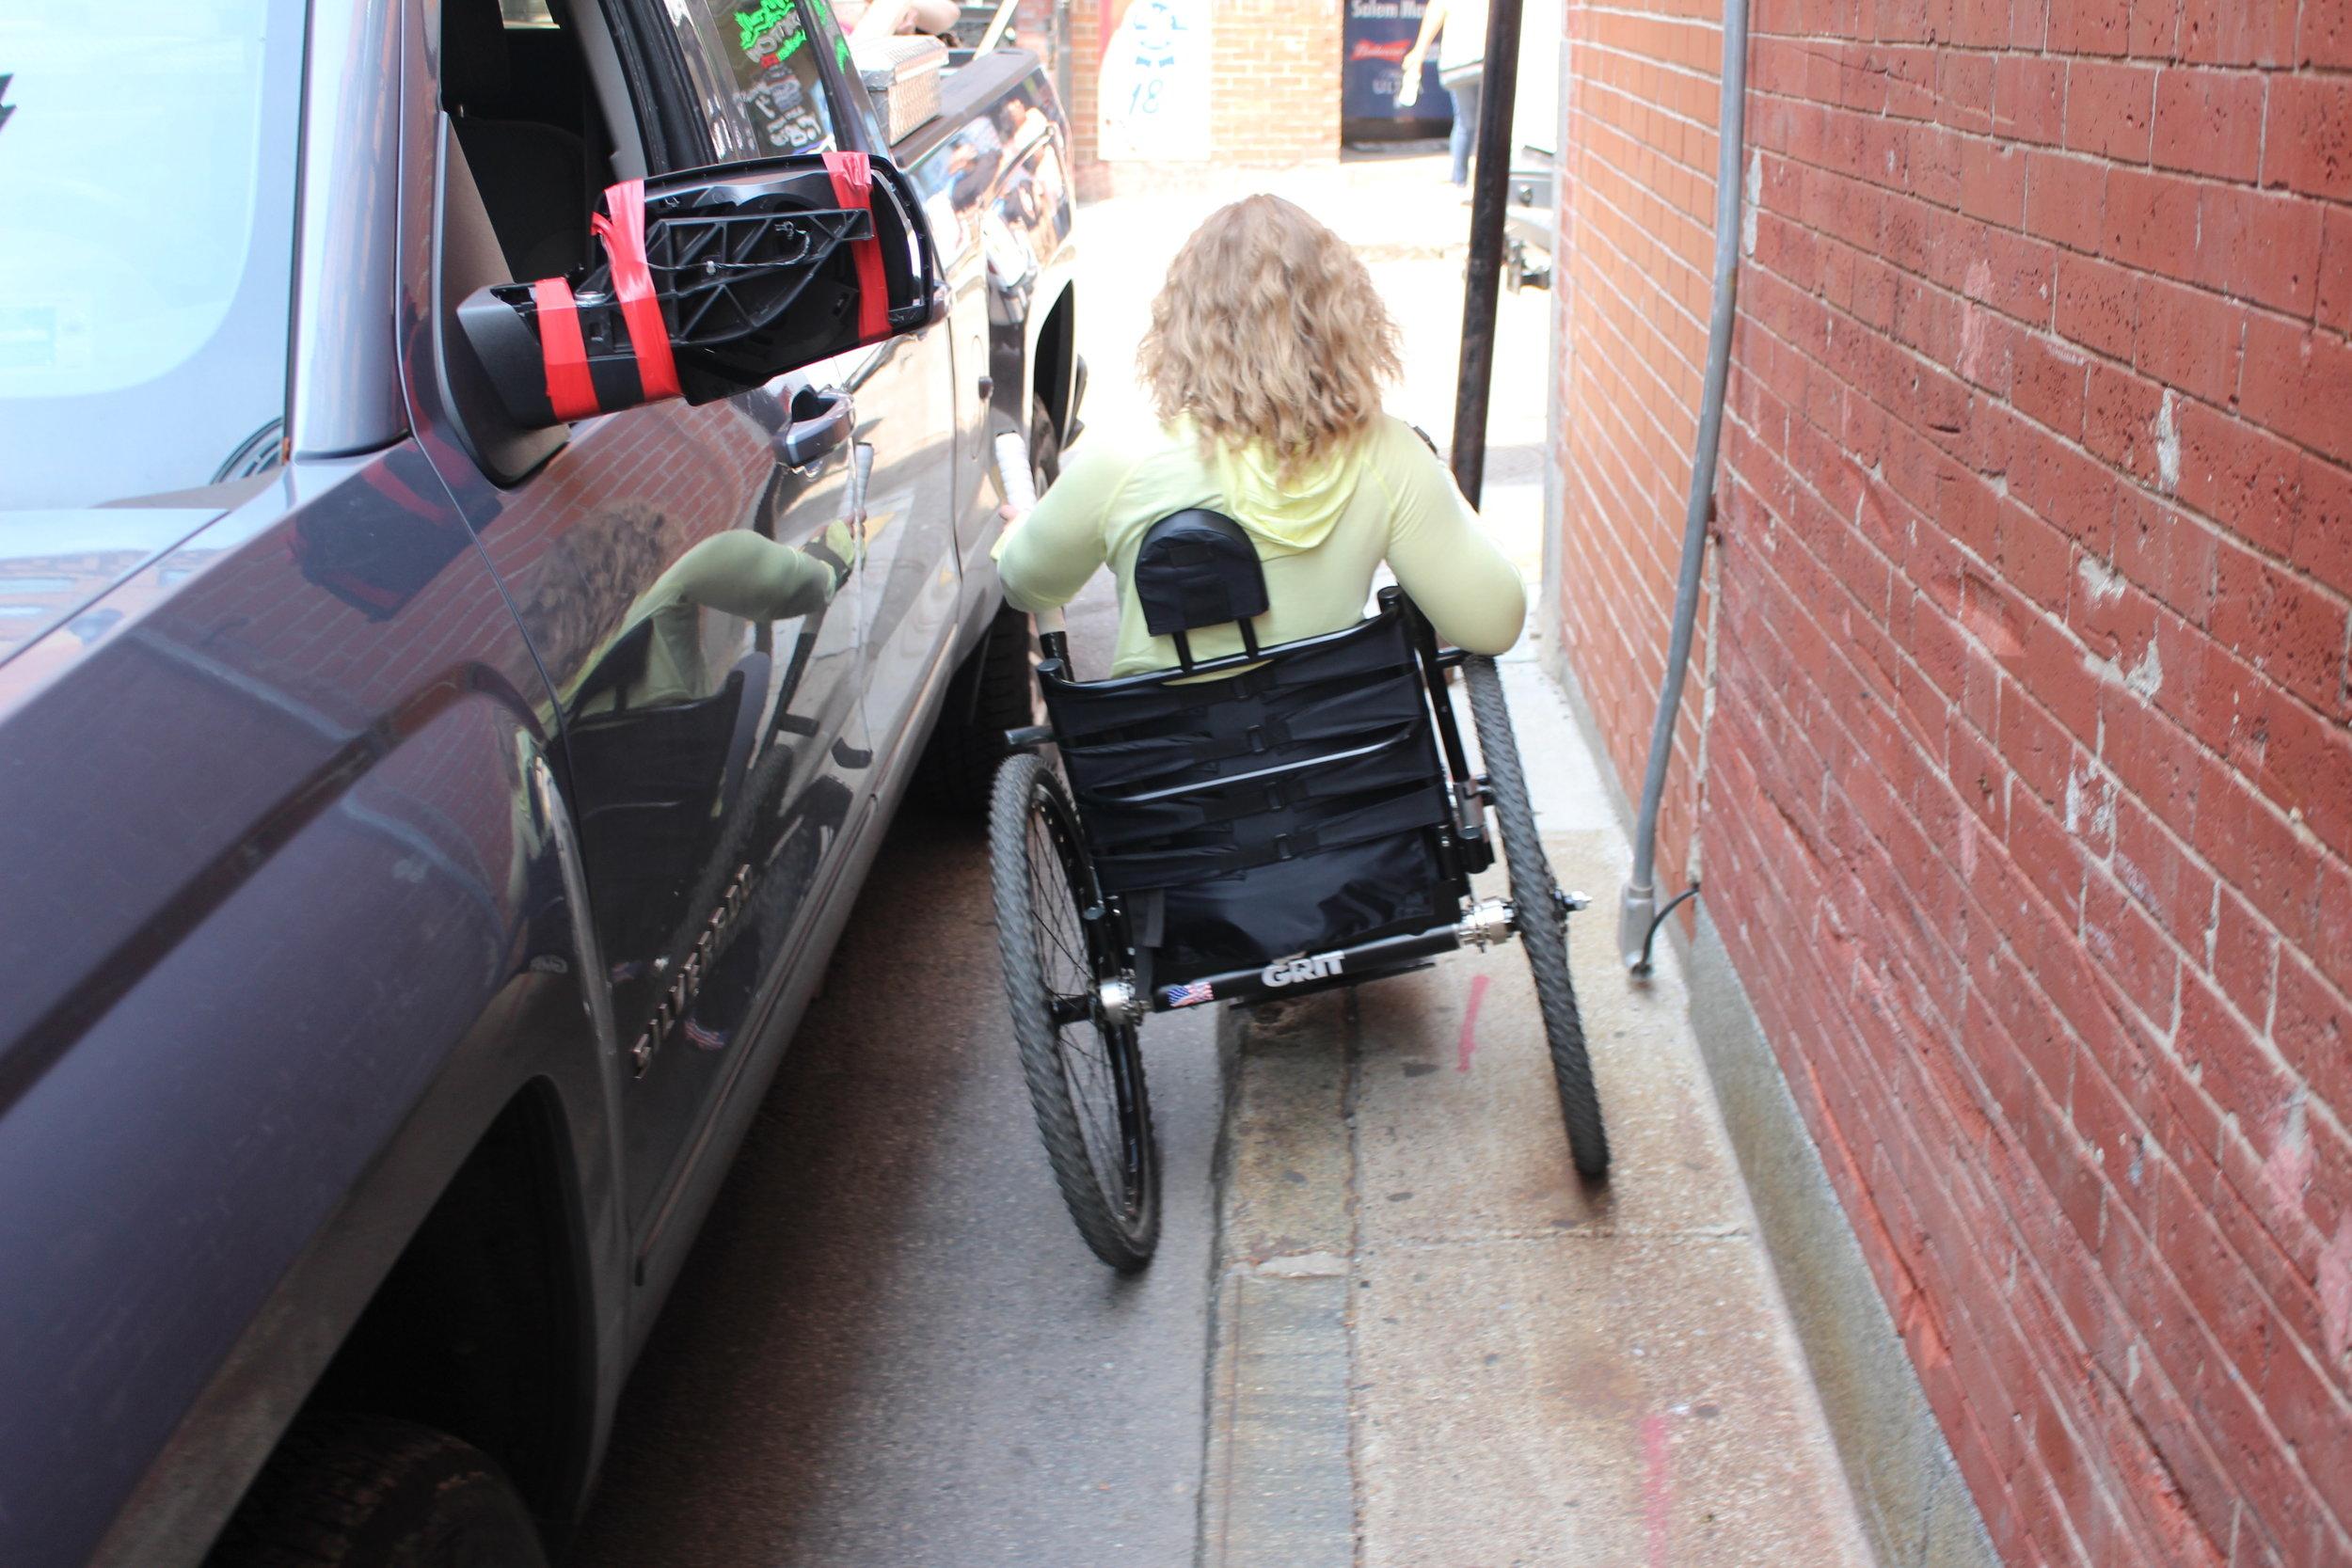 Ninja maneuvering my GRIT Freedom Chair through a narrow street near Old North Church.